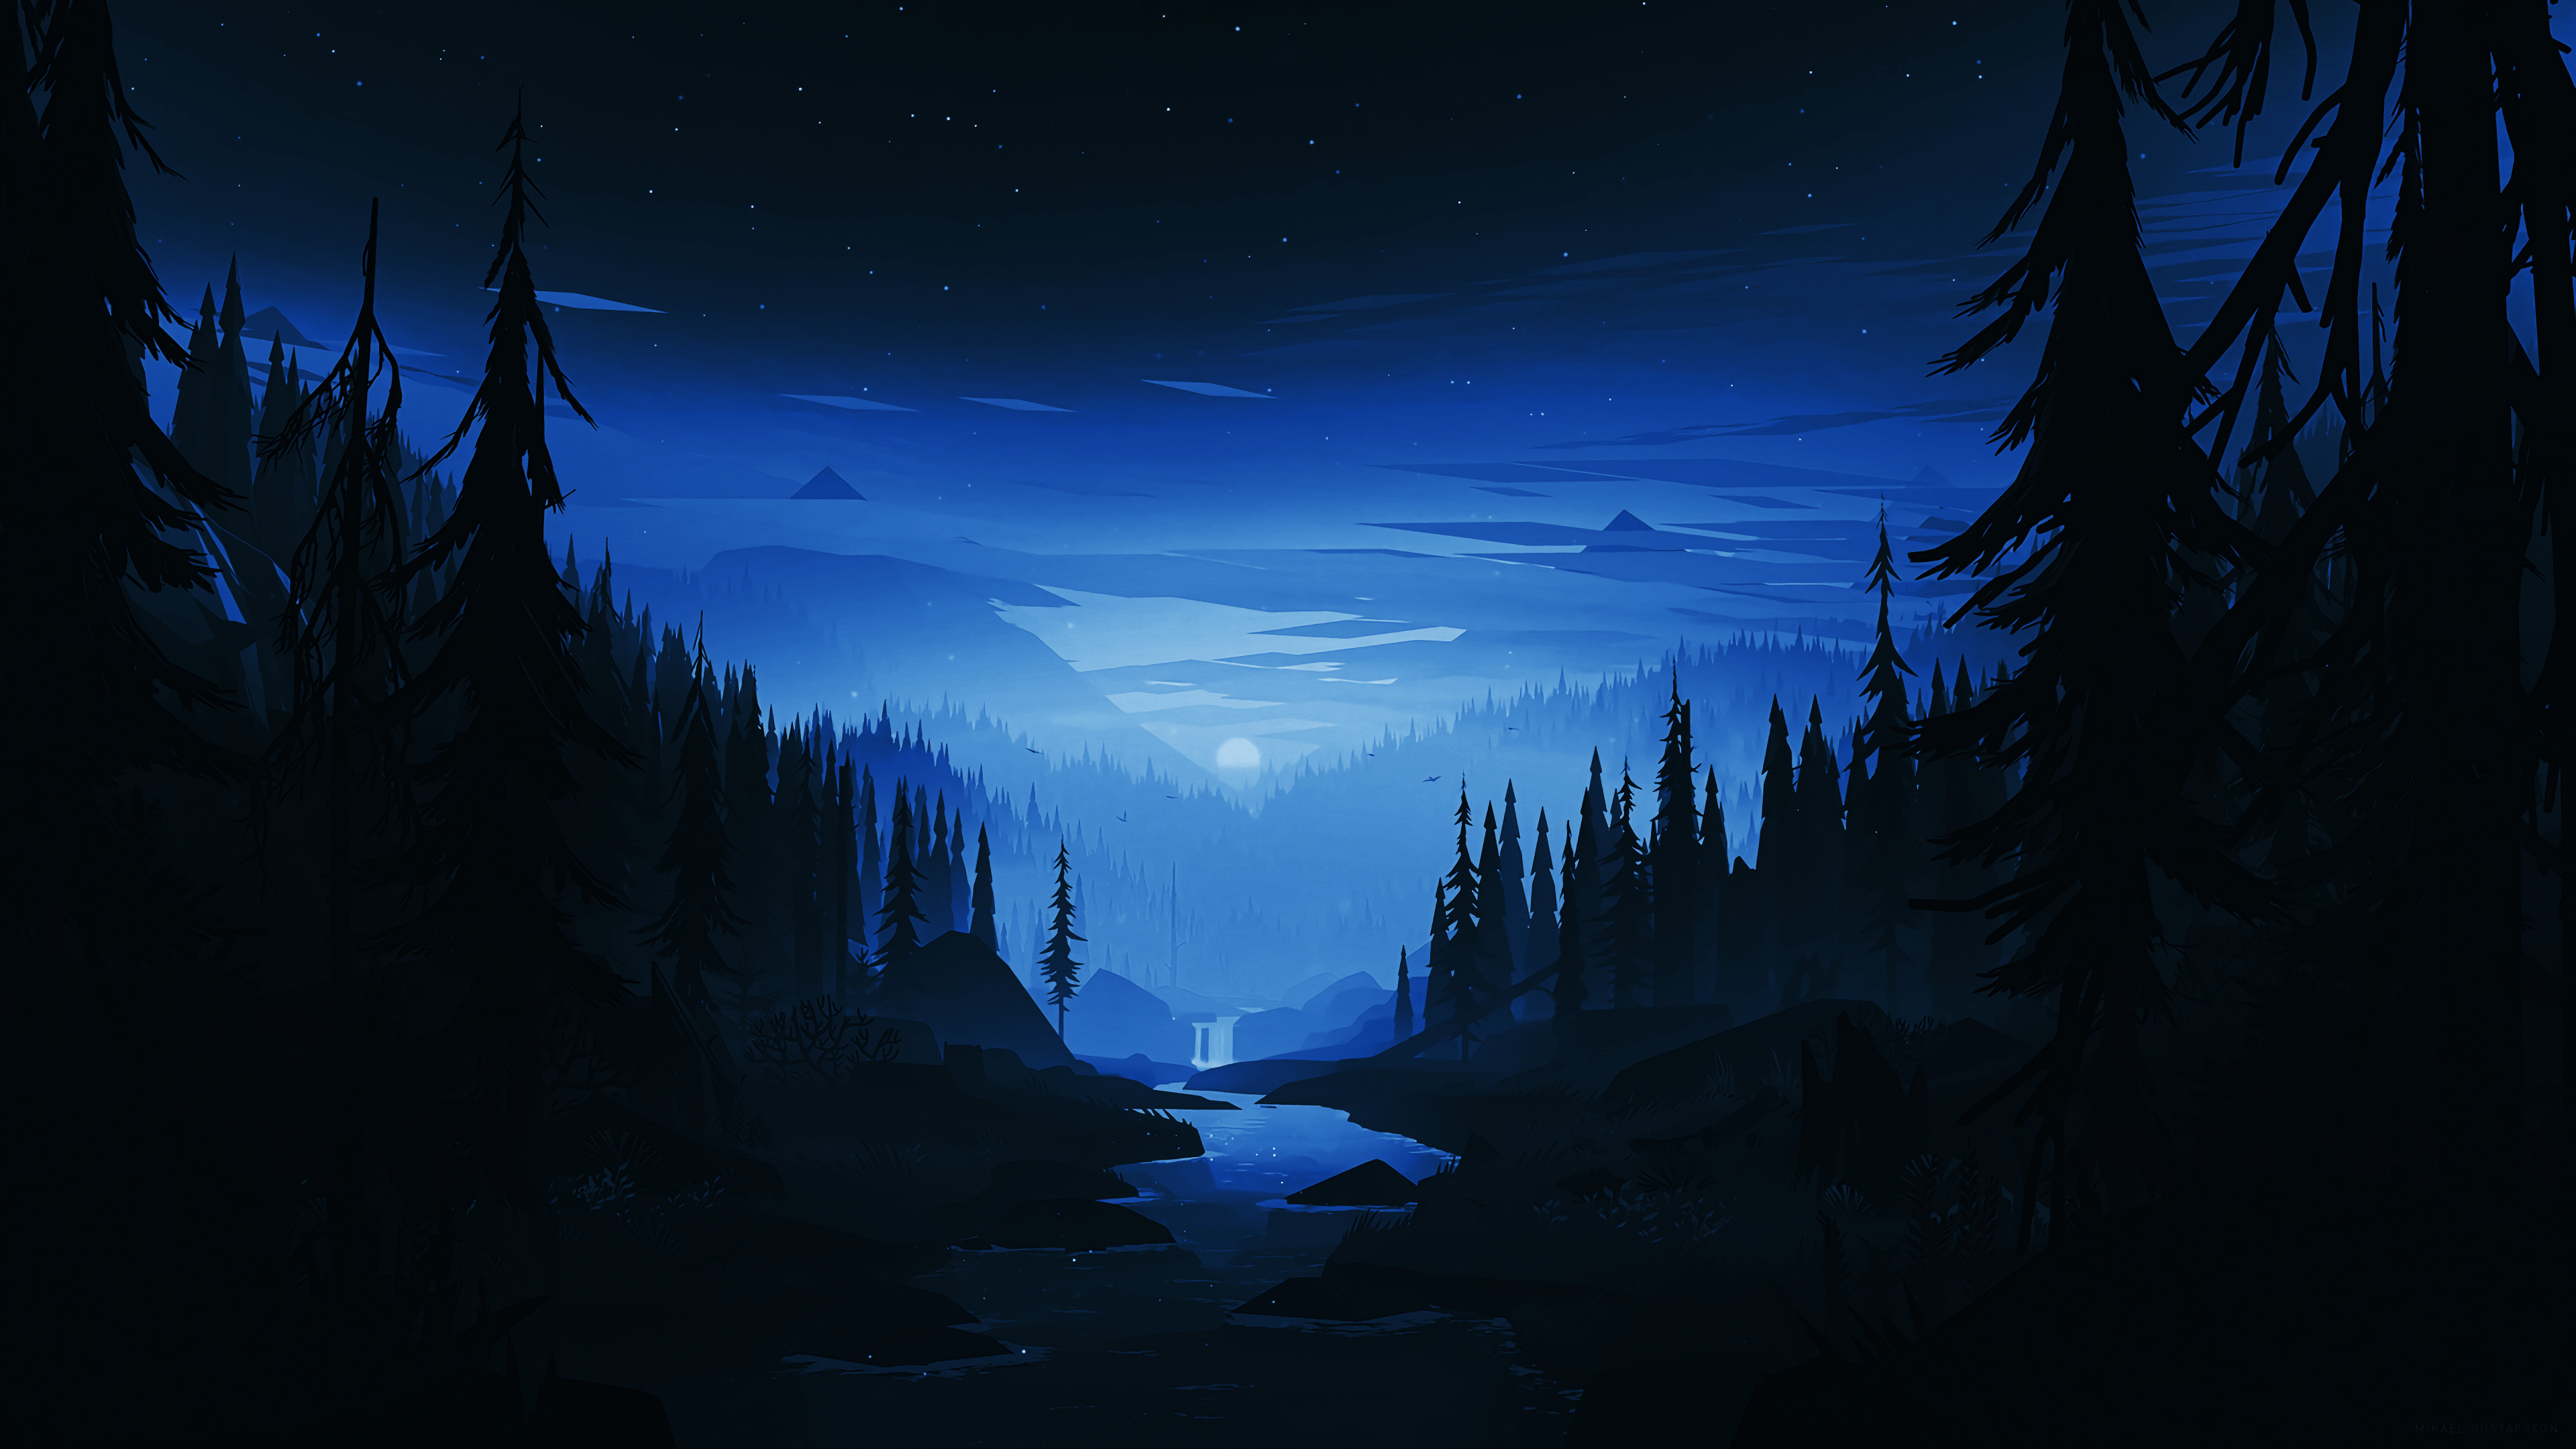 Download 3840x2160 wallpaper dark night, river, forest ...